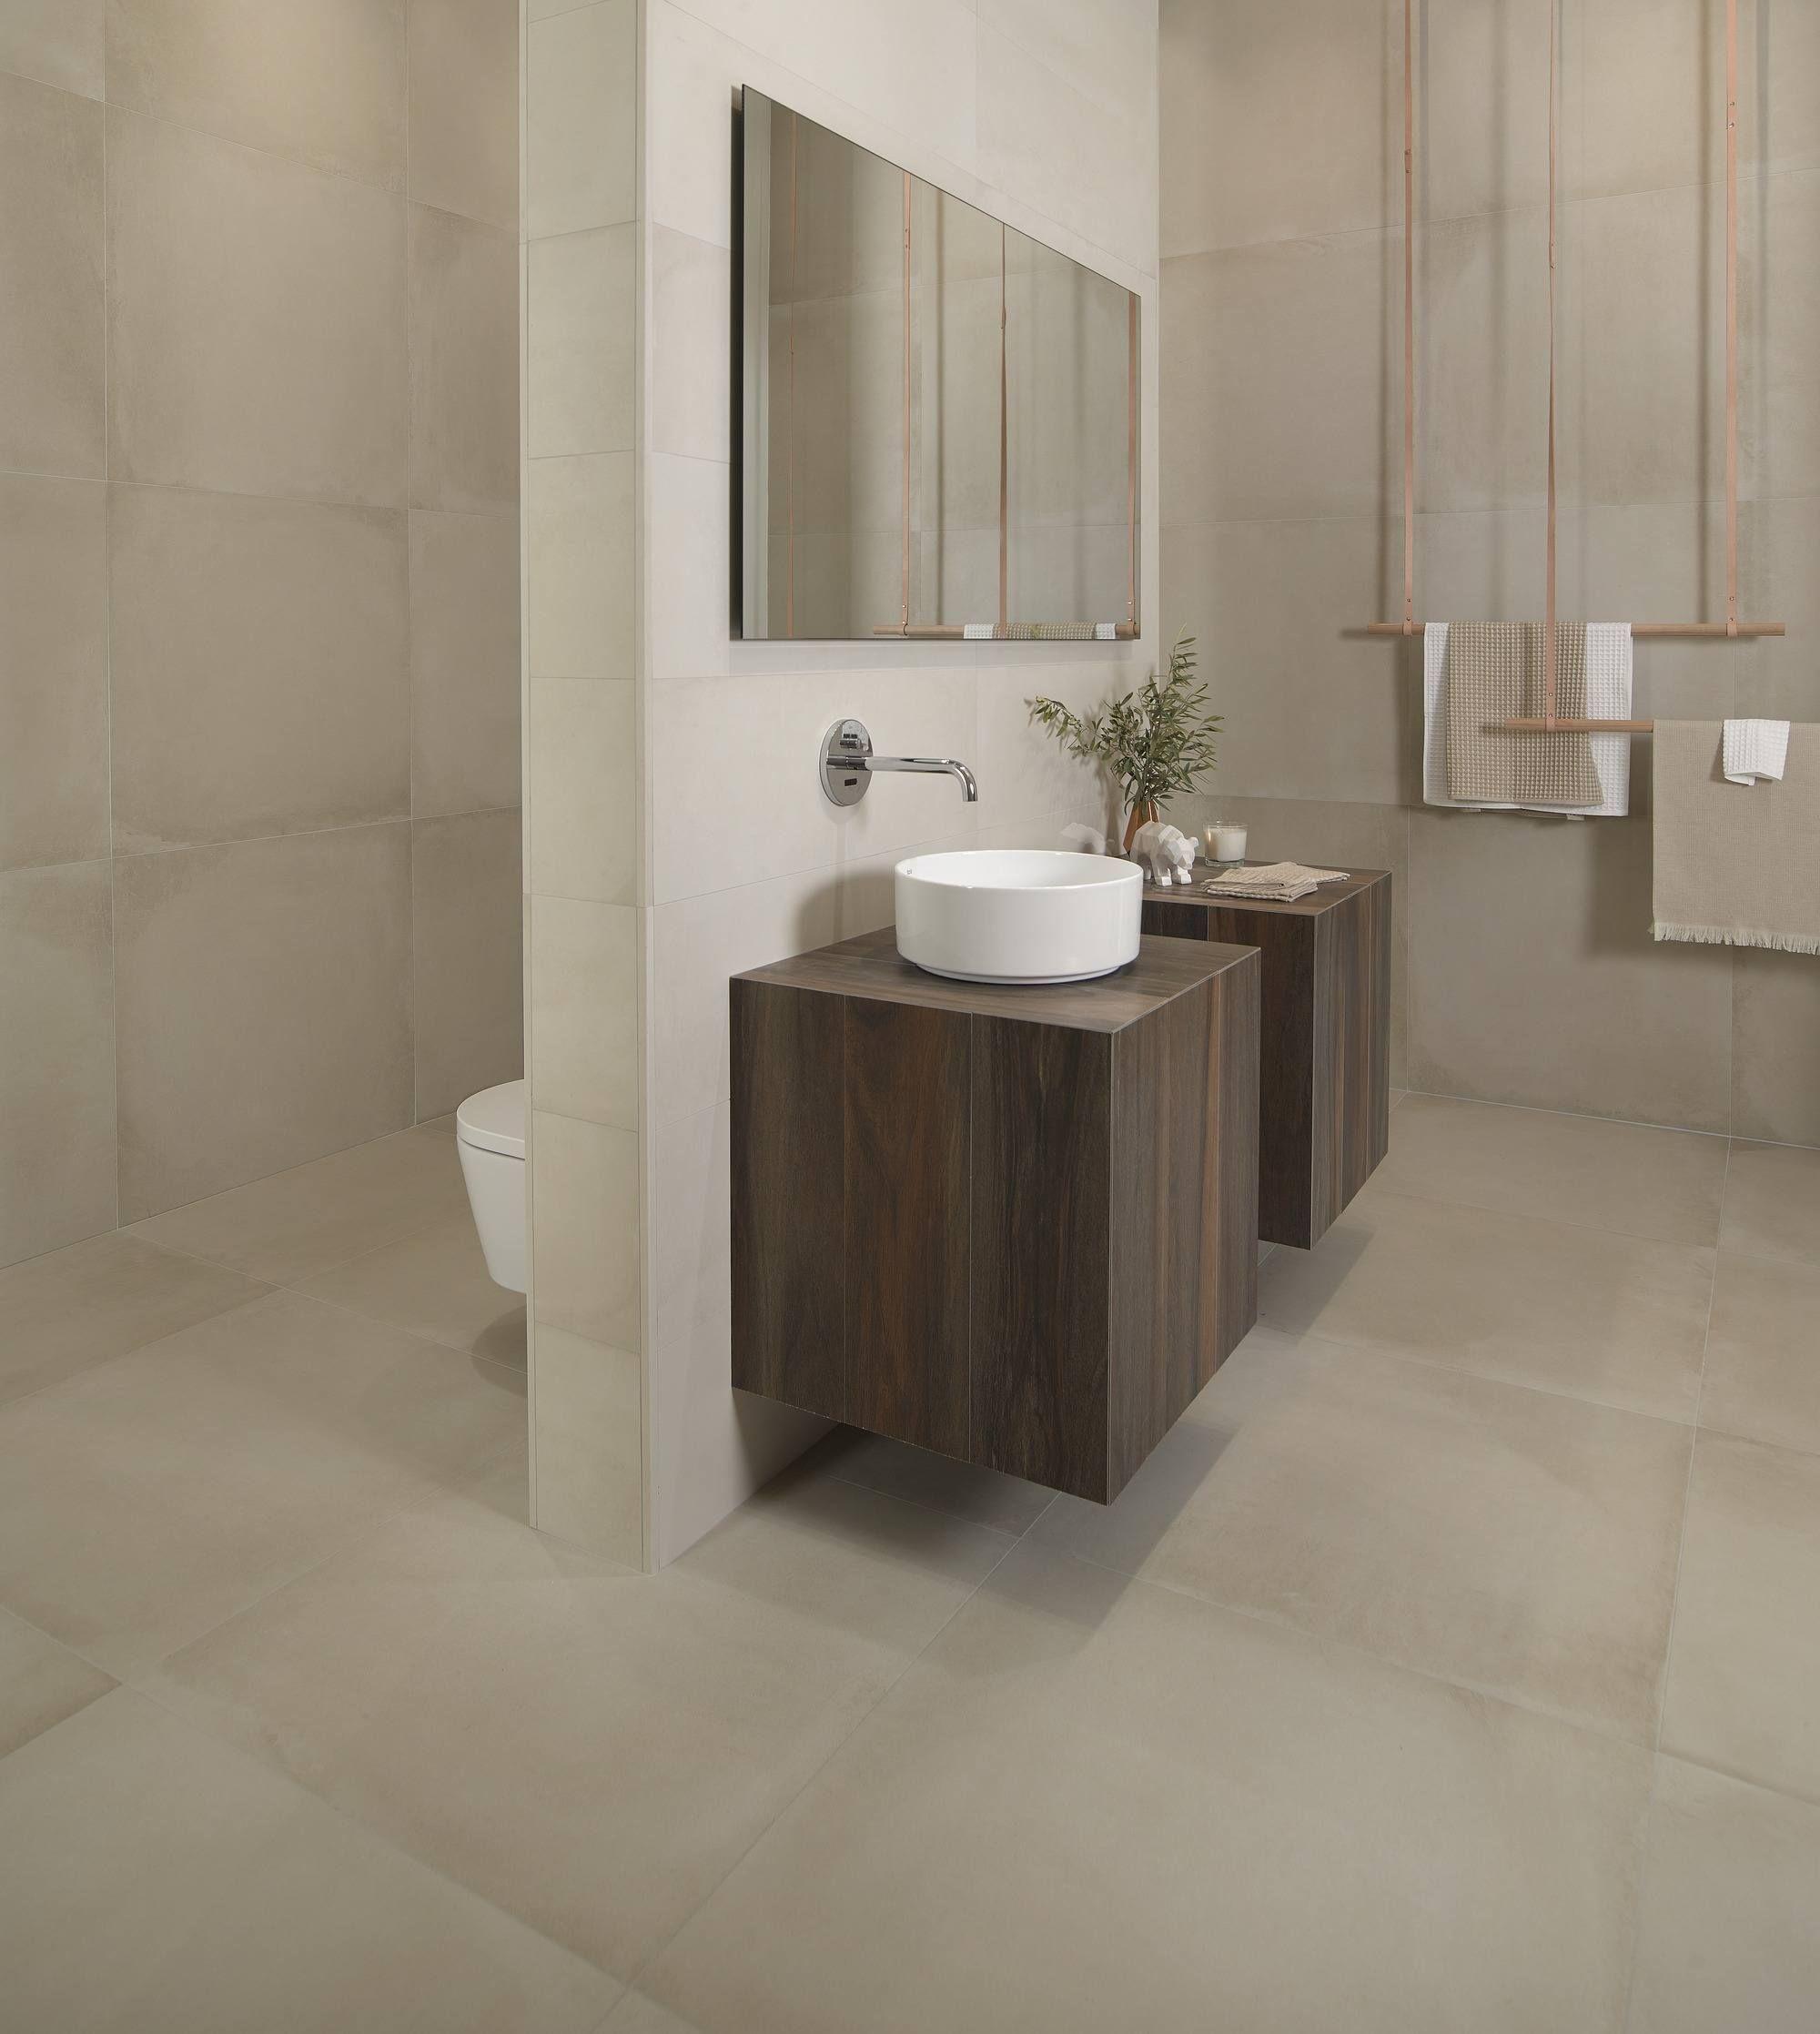 Derby Tiles Colored Body Porcelain Roca Tile Usa Bathroom